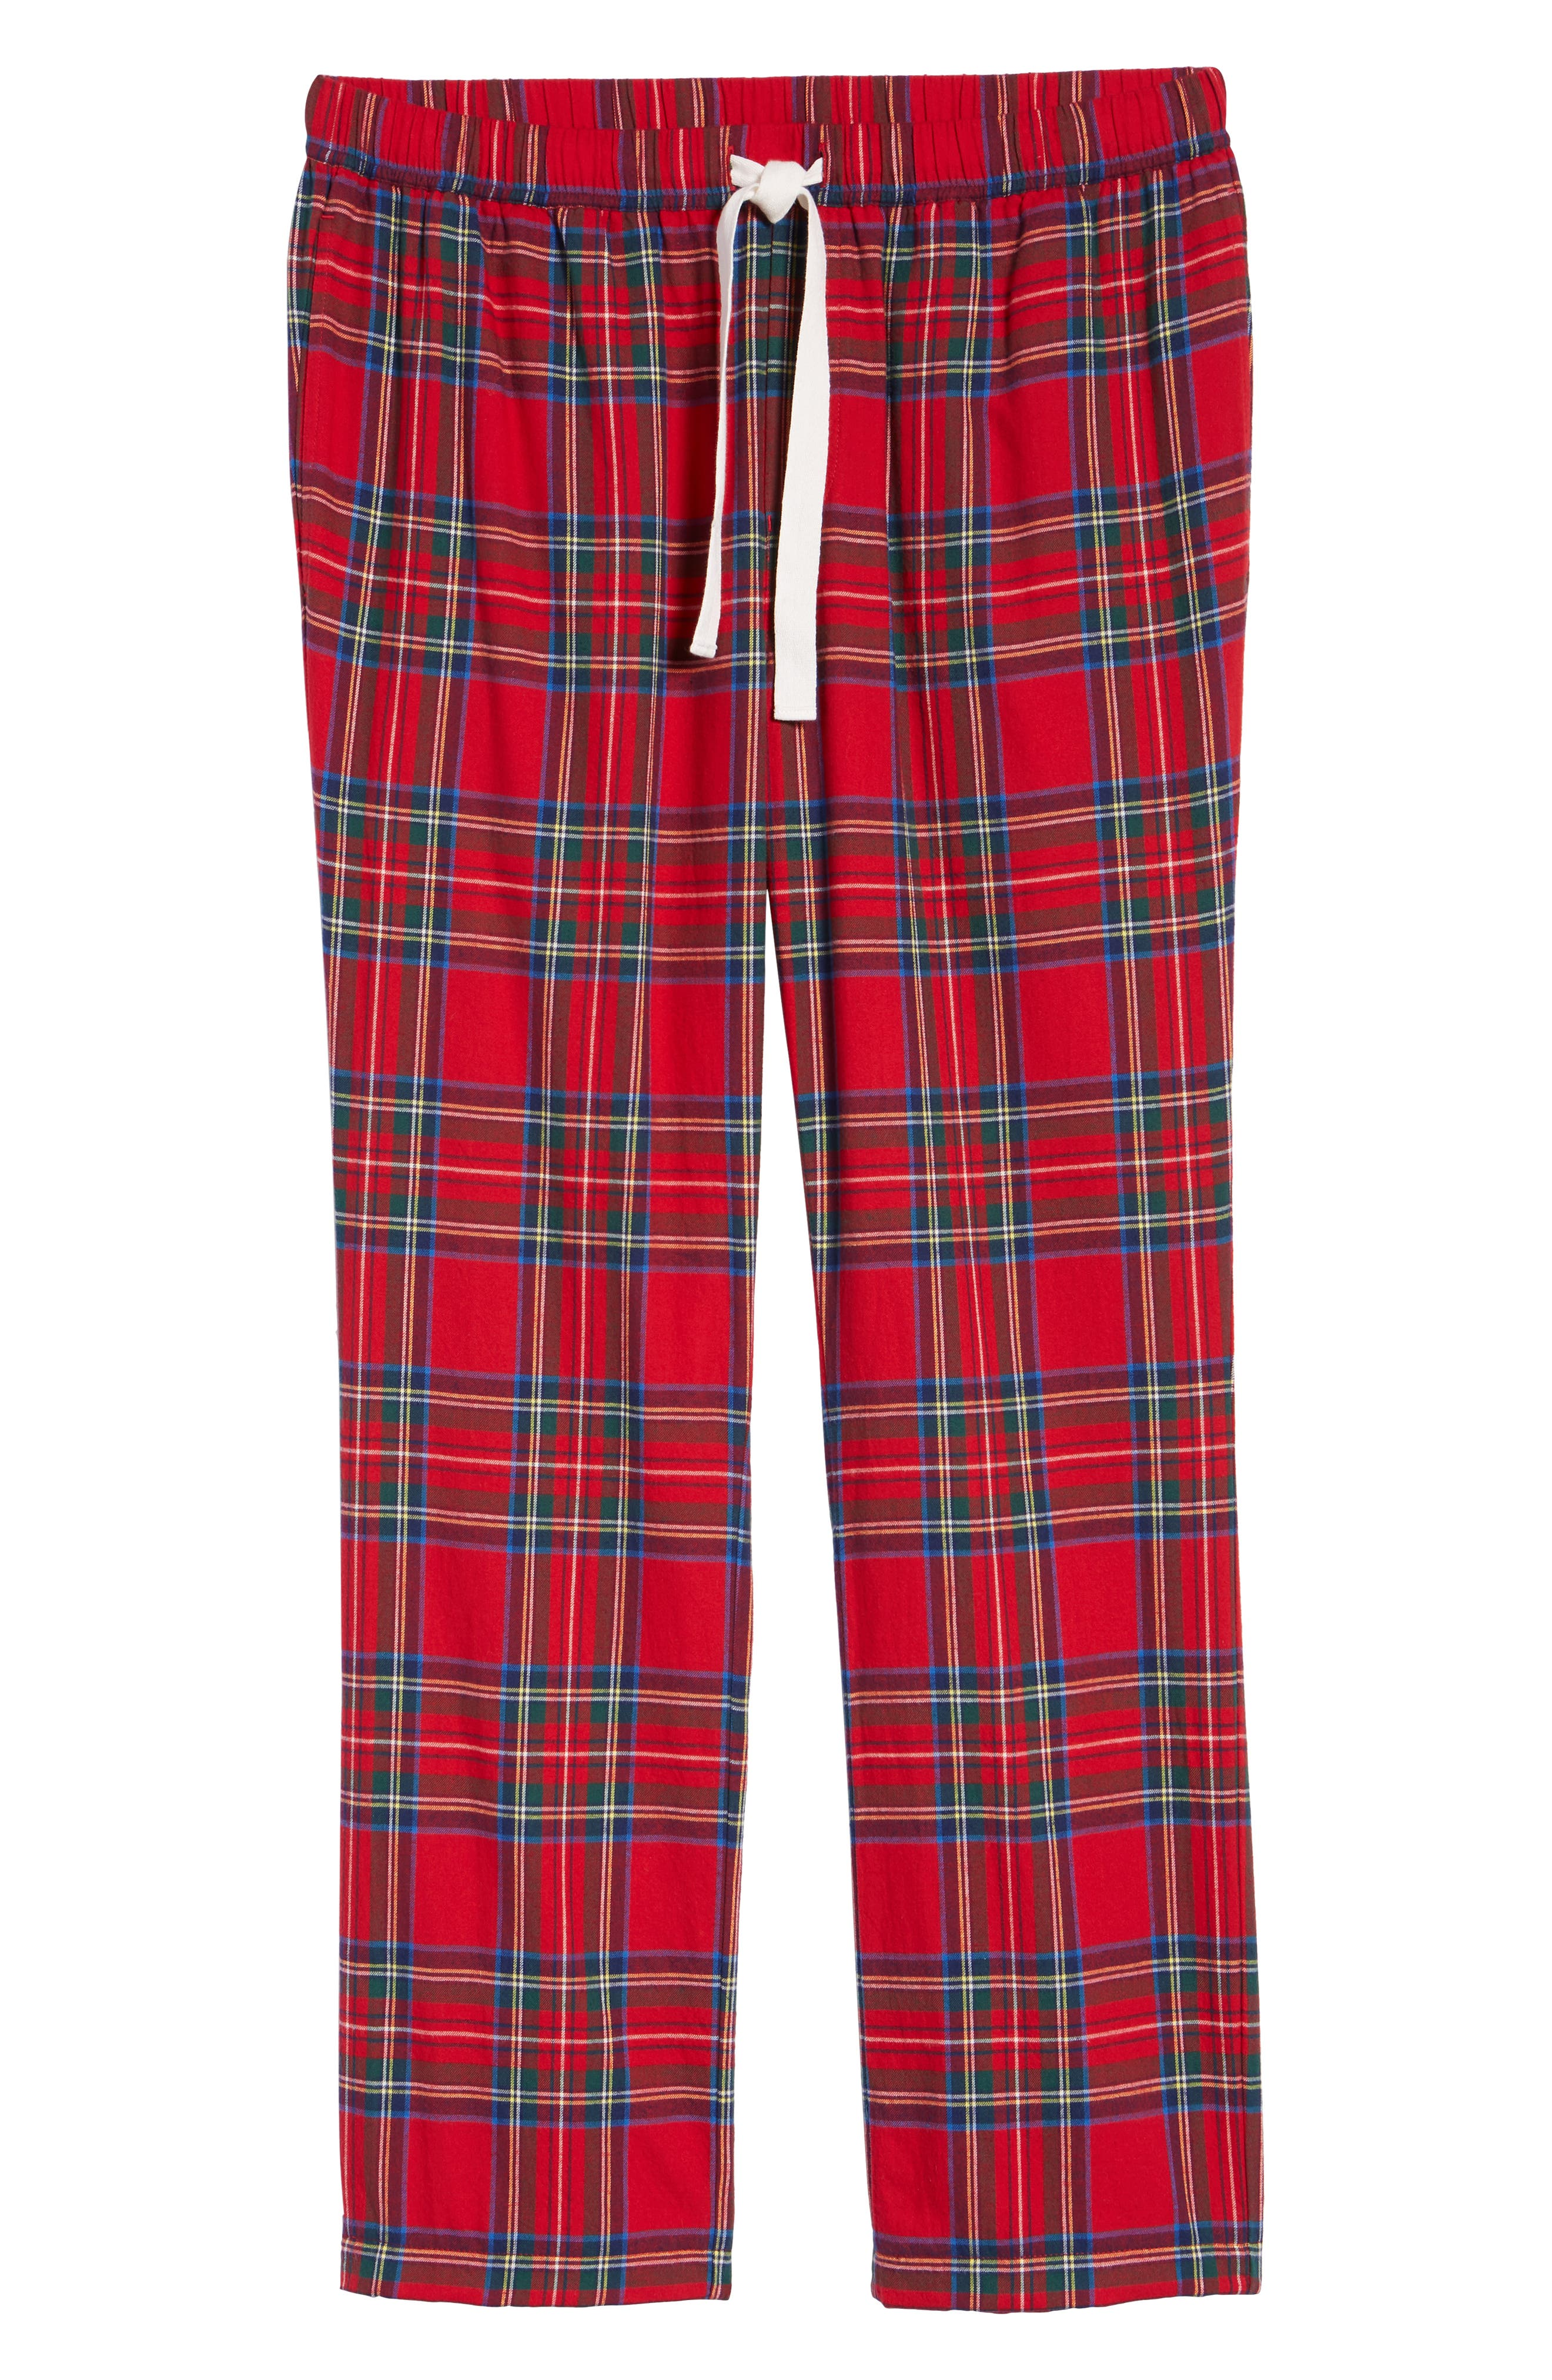 Jolly Plaid Cotton Flannel Pajama Pants,                             Alternate thumbnail 6, color,                             786